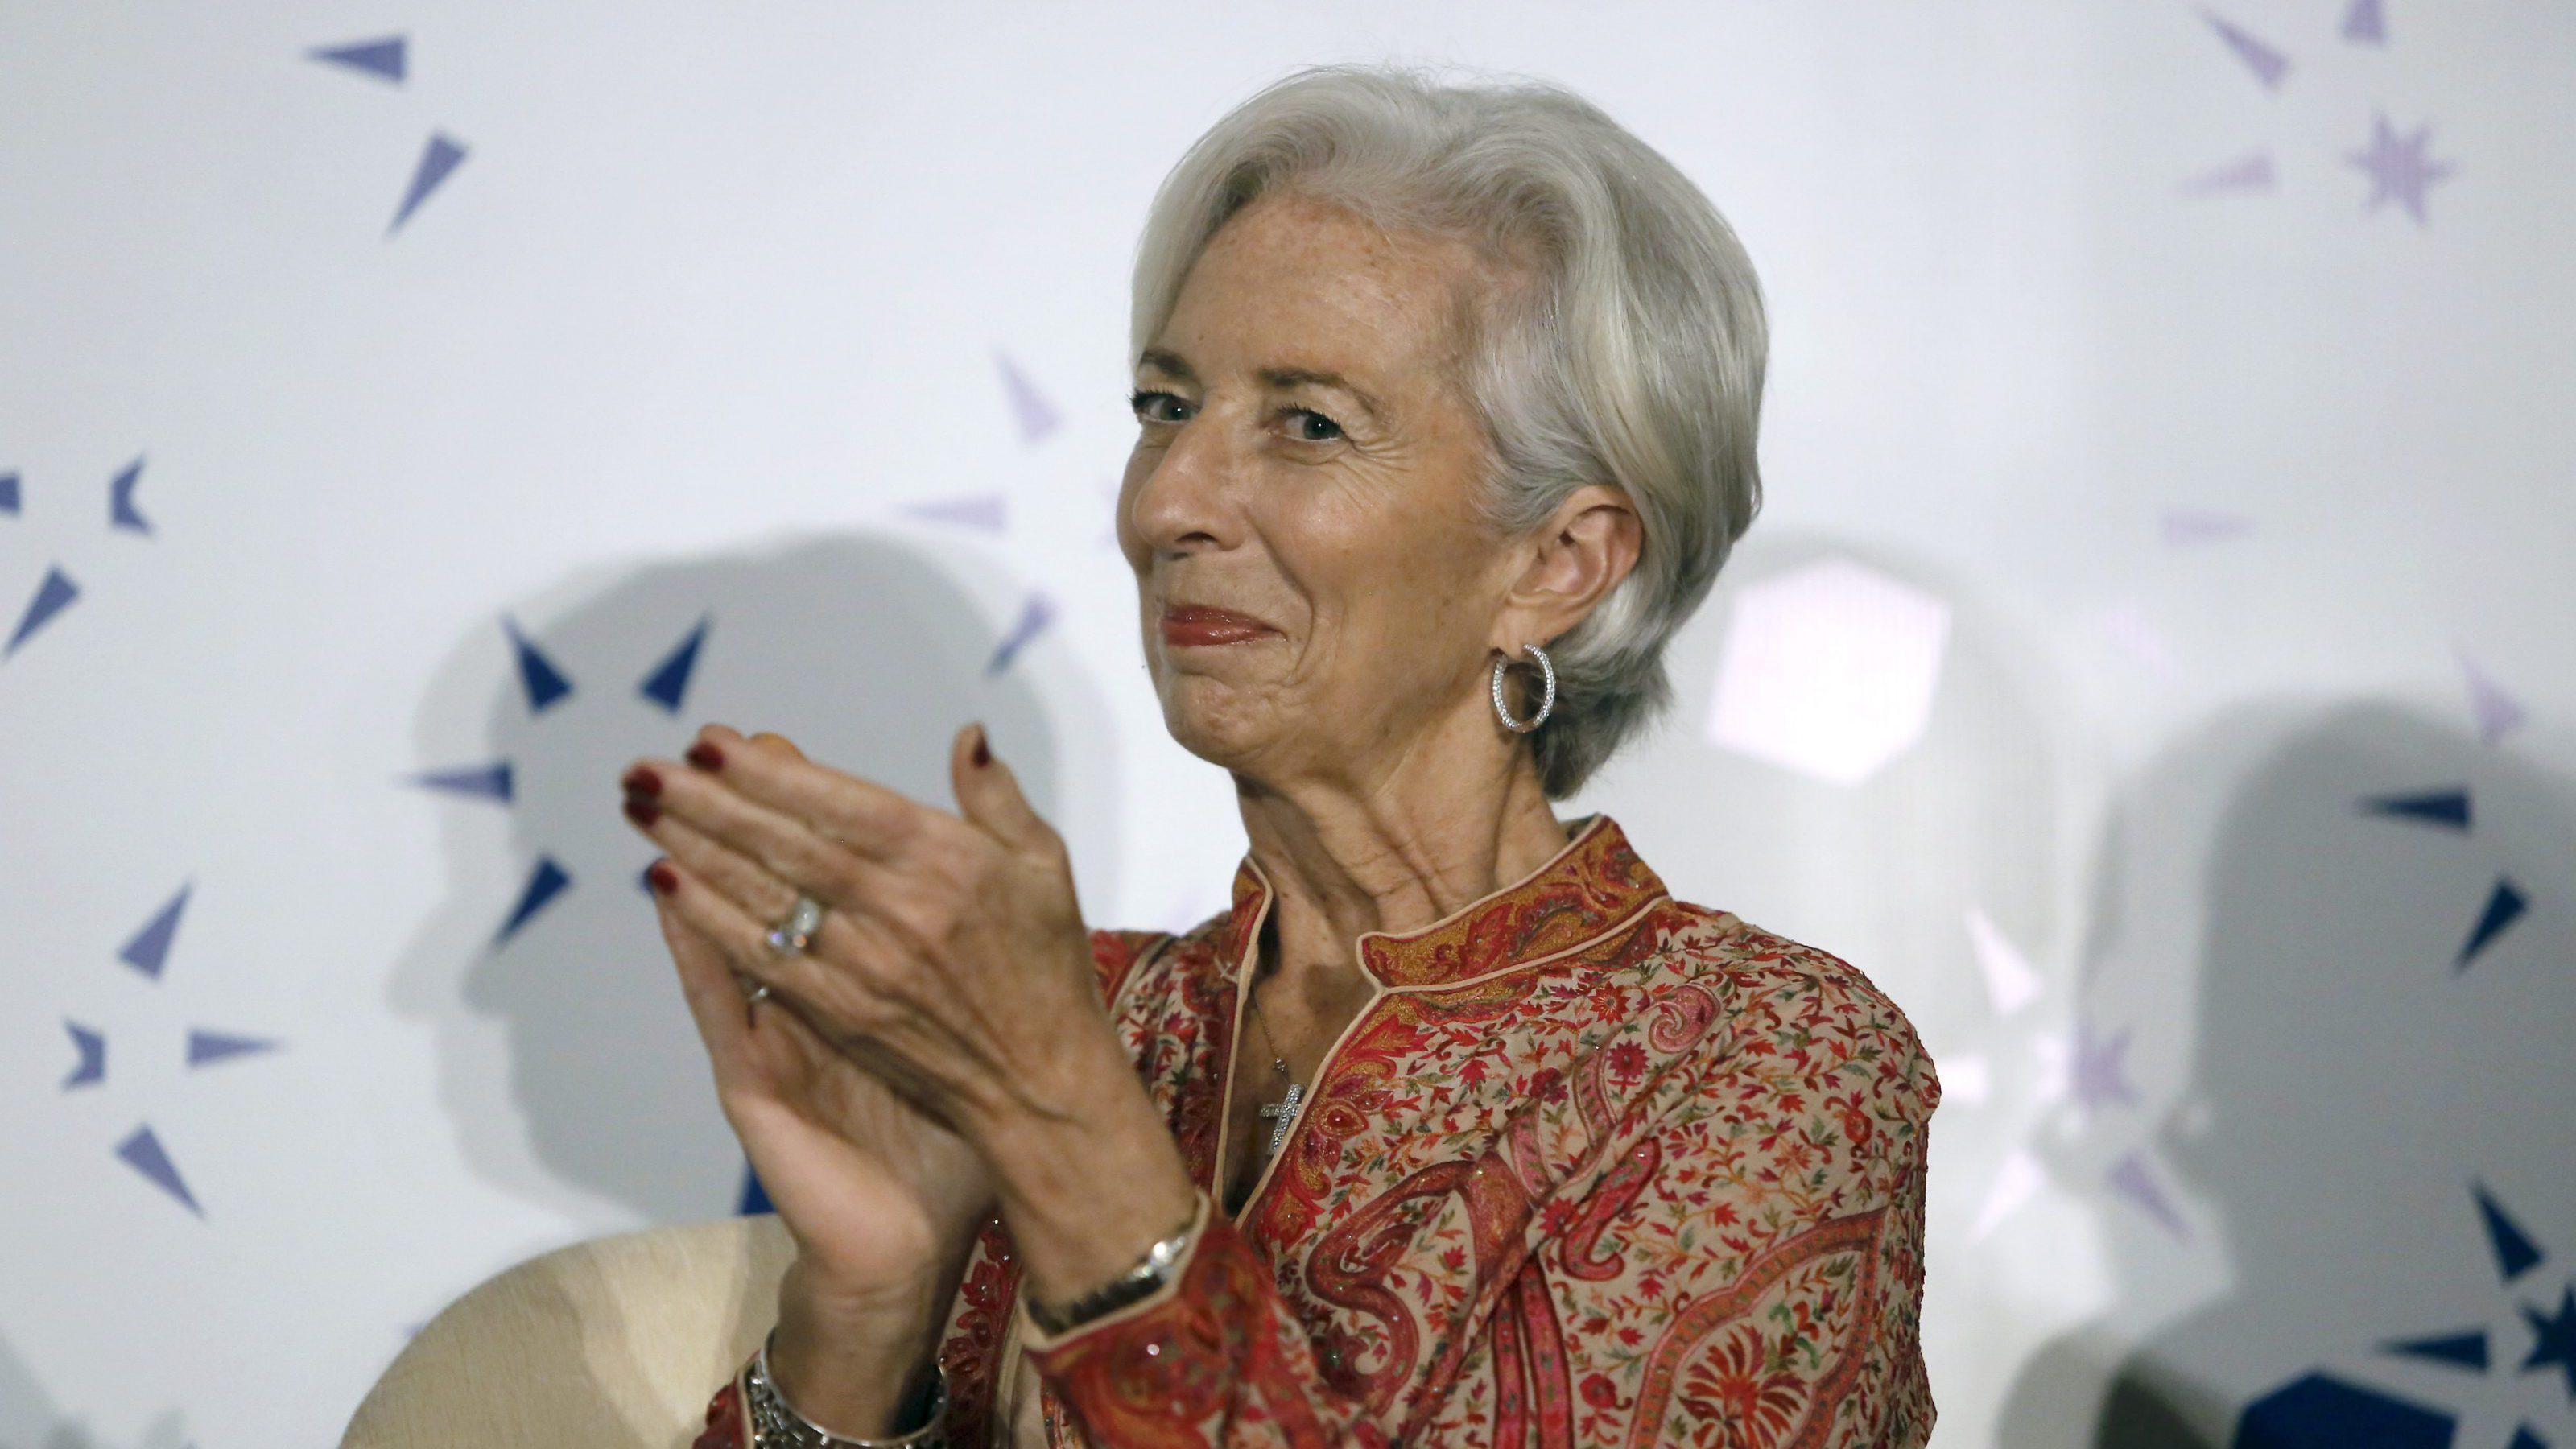 International Monetary Fund (IMF) Managing Director Christine Lagarde applauds